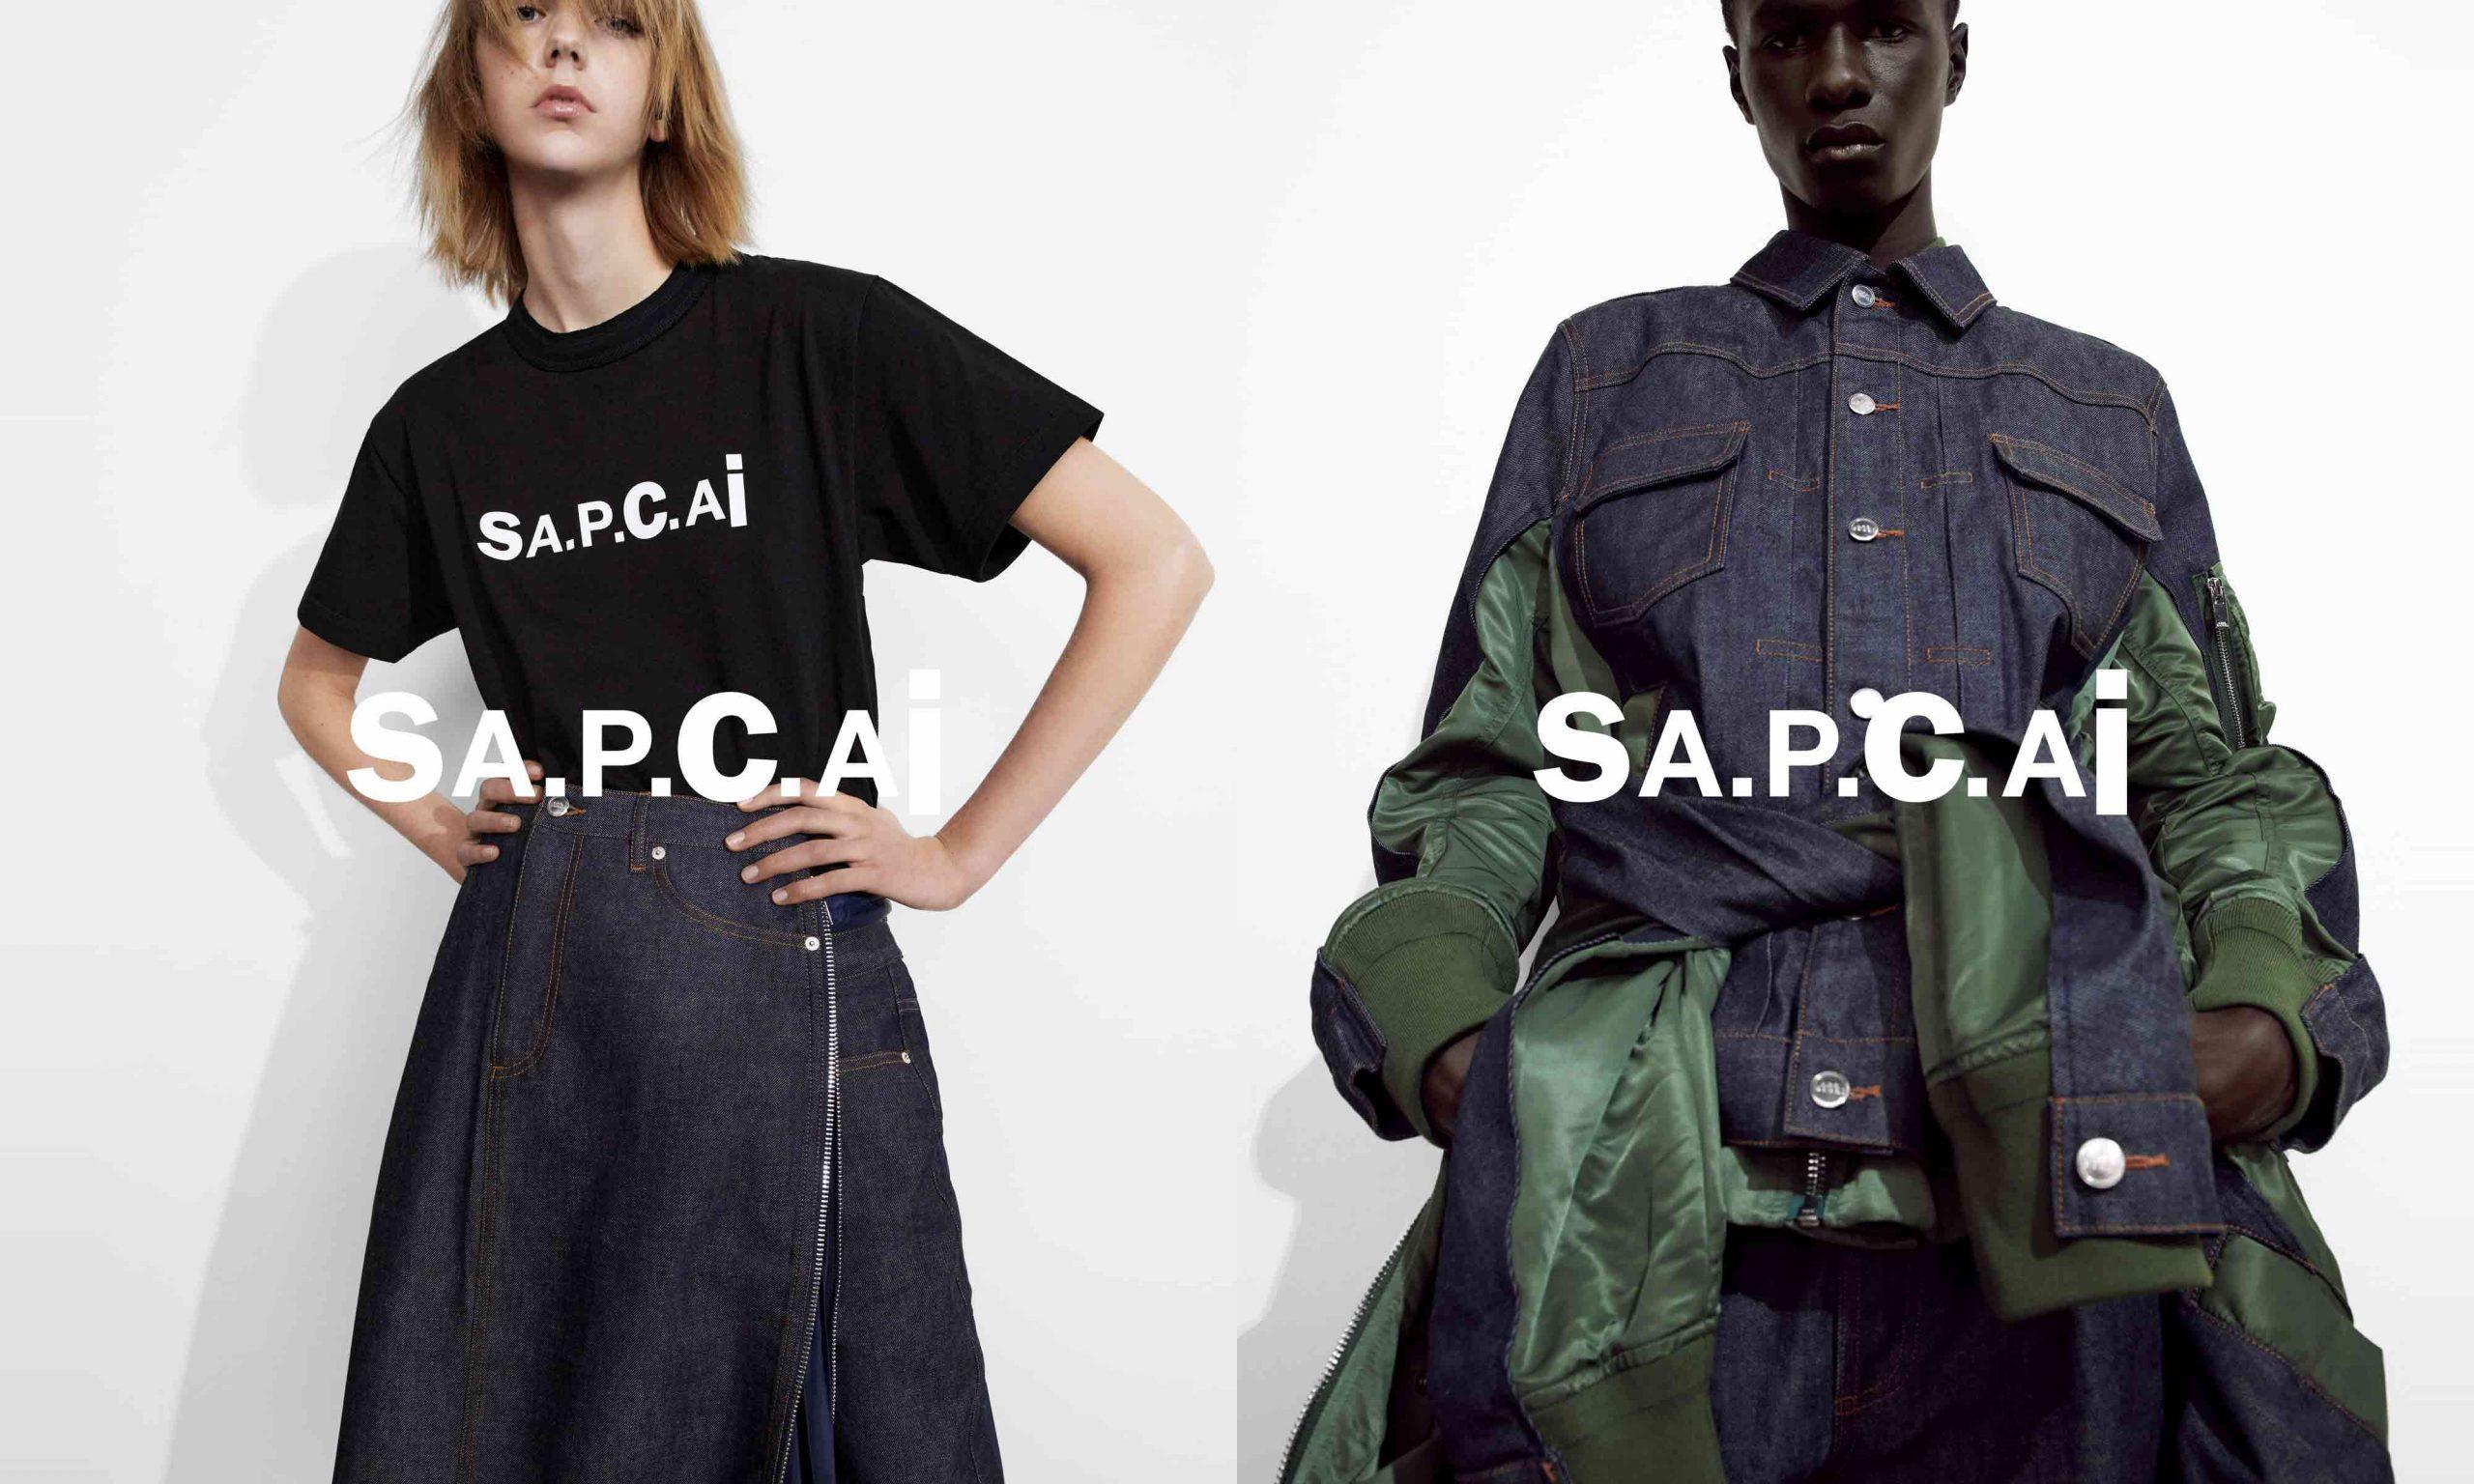 sacai x A.P.C.「INTERACTION #9」联名 Lookbook 及单品完整一览